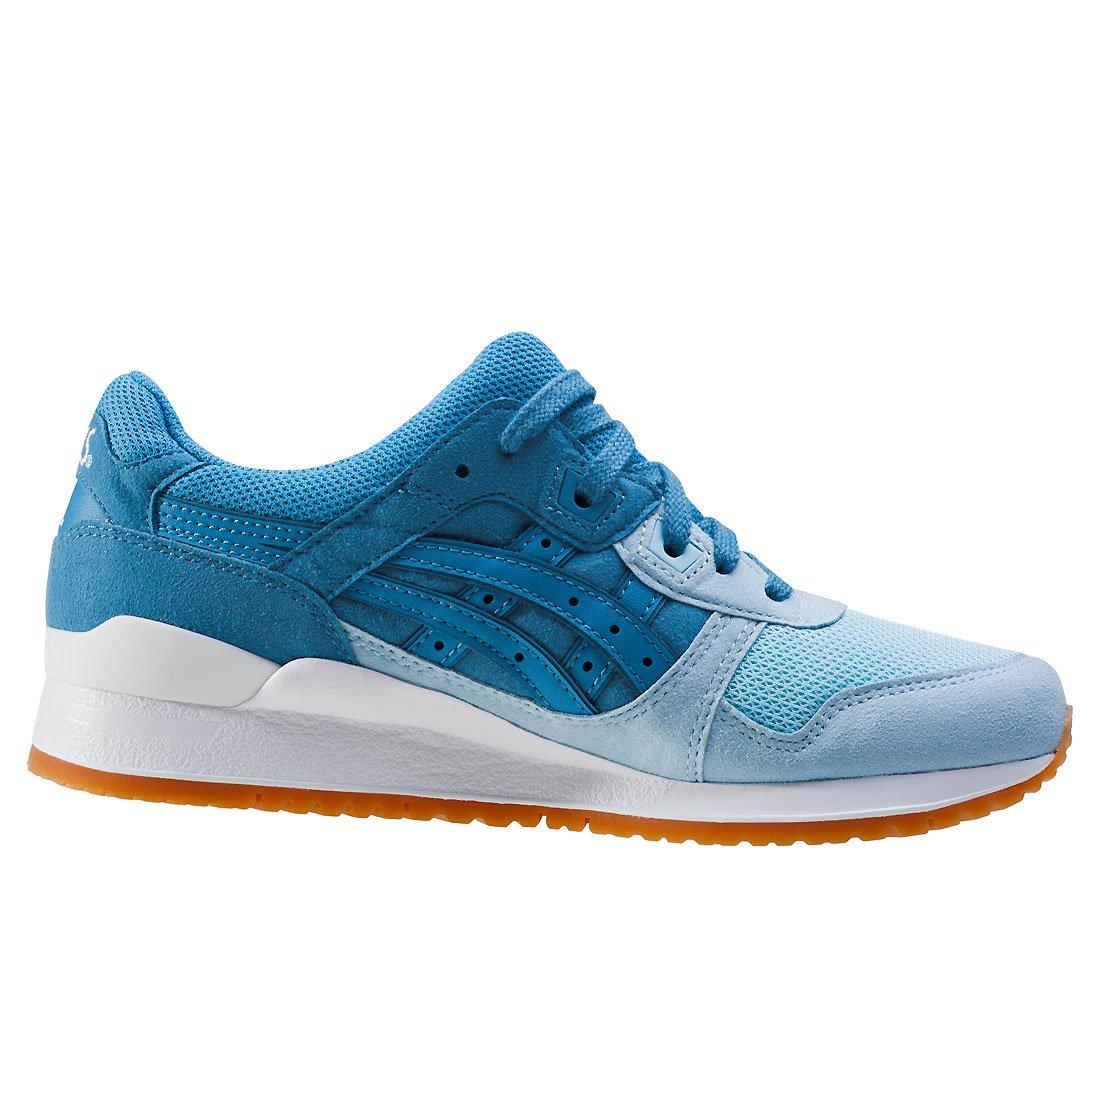 Asics Gel-Lyte Herren Iii Herren Gel-Lyte Sneaker Blau Blau d30860